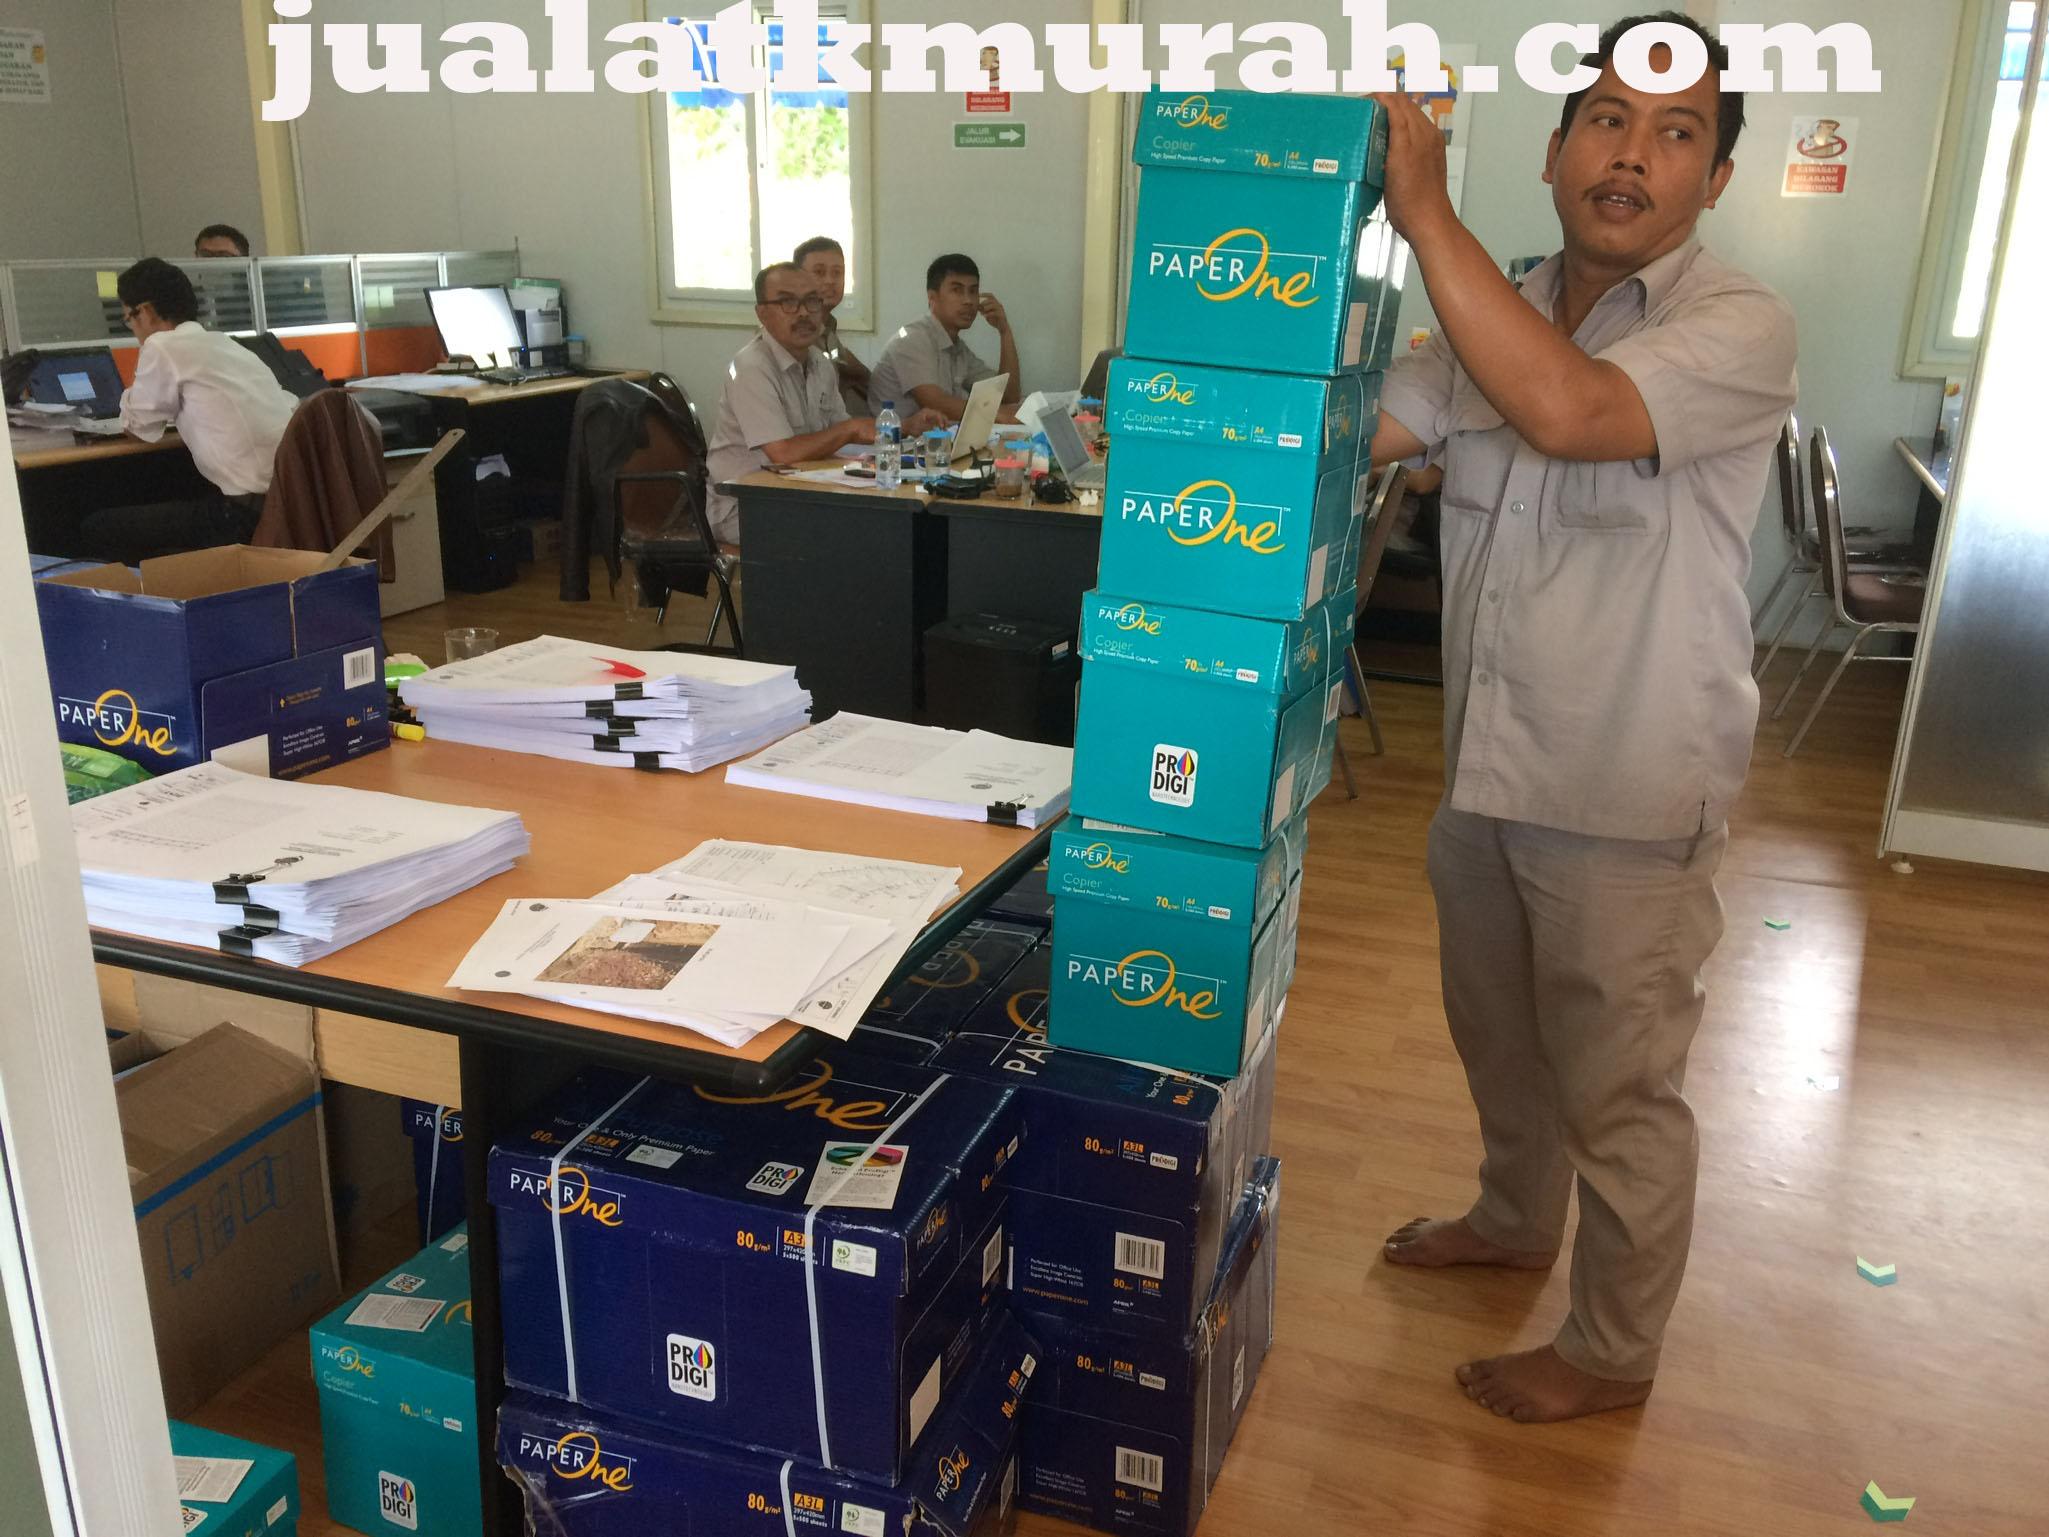 Jual ATK Murah Kalisari Jakarta Timur